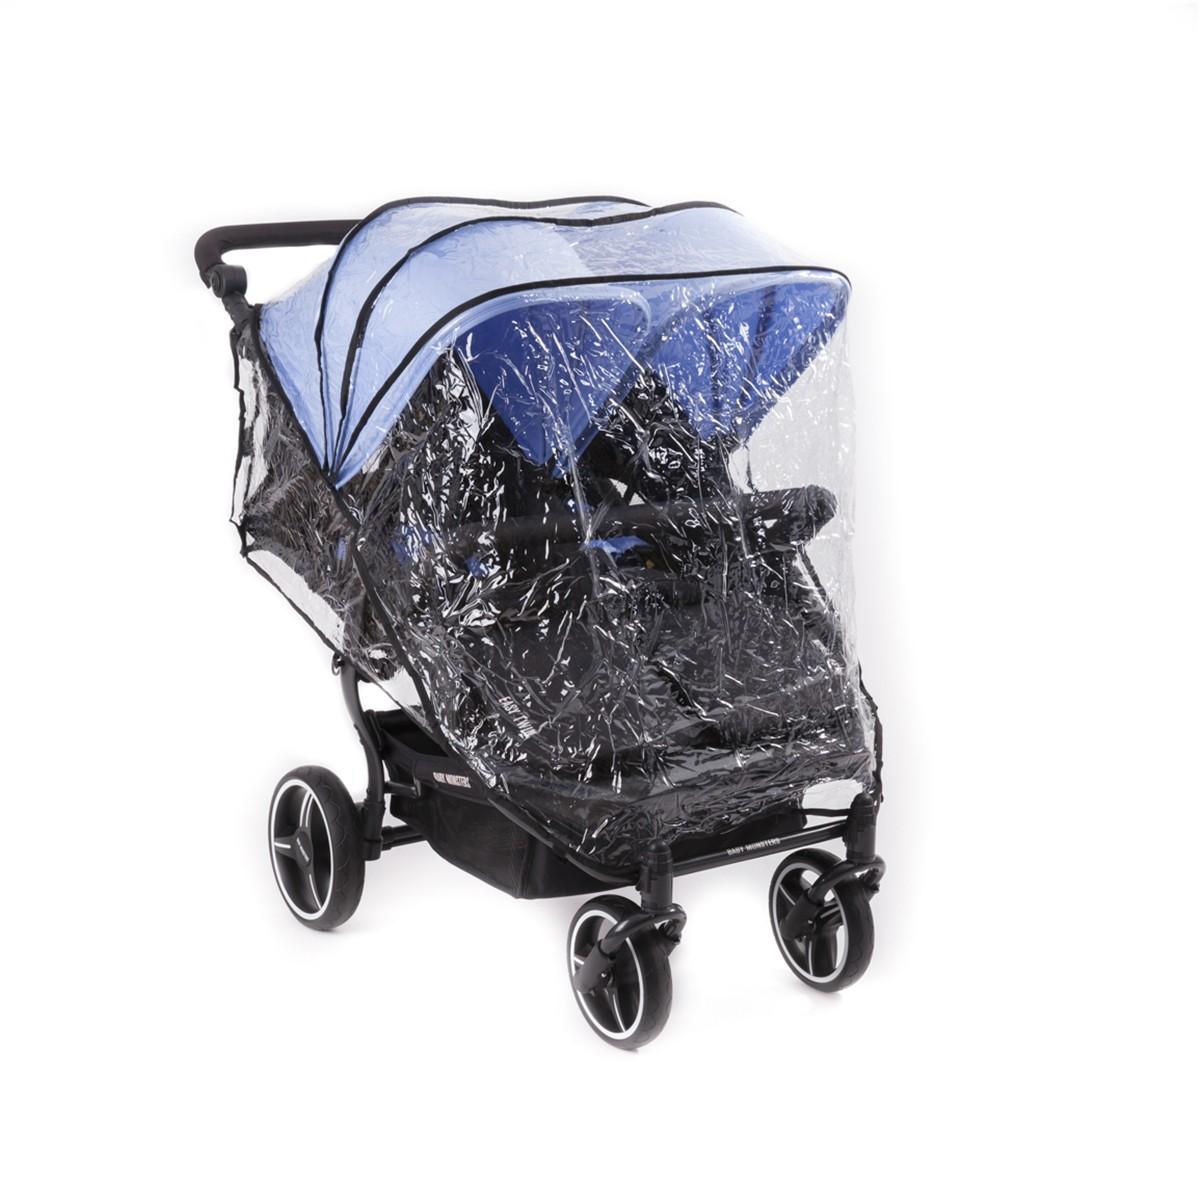 Burbuja de lluvia Easy Twin Baby Monsters